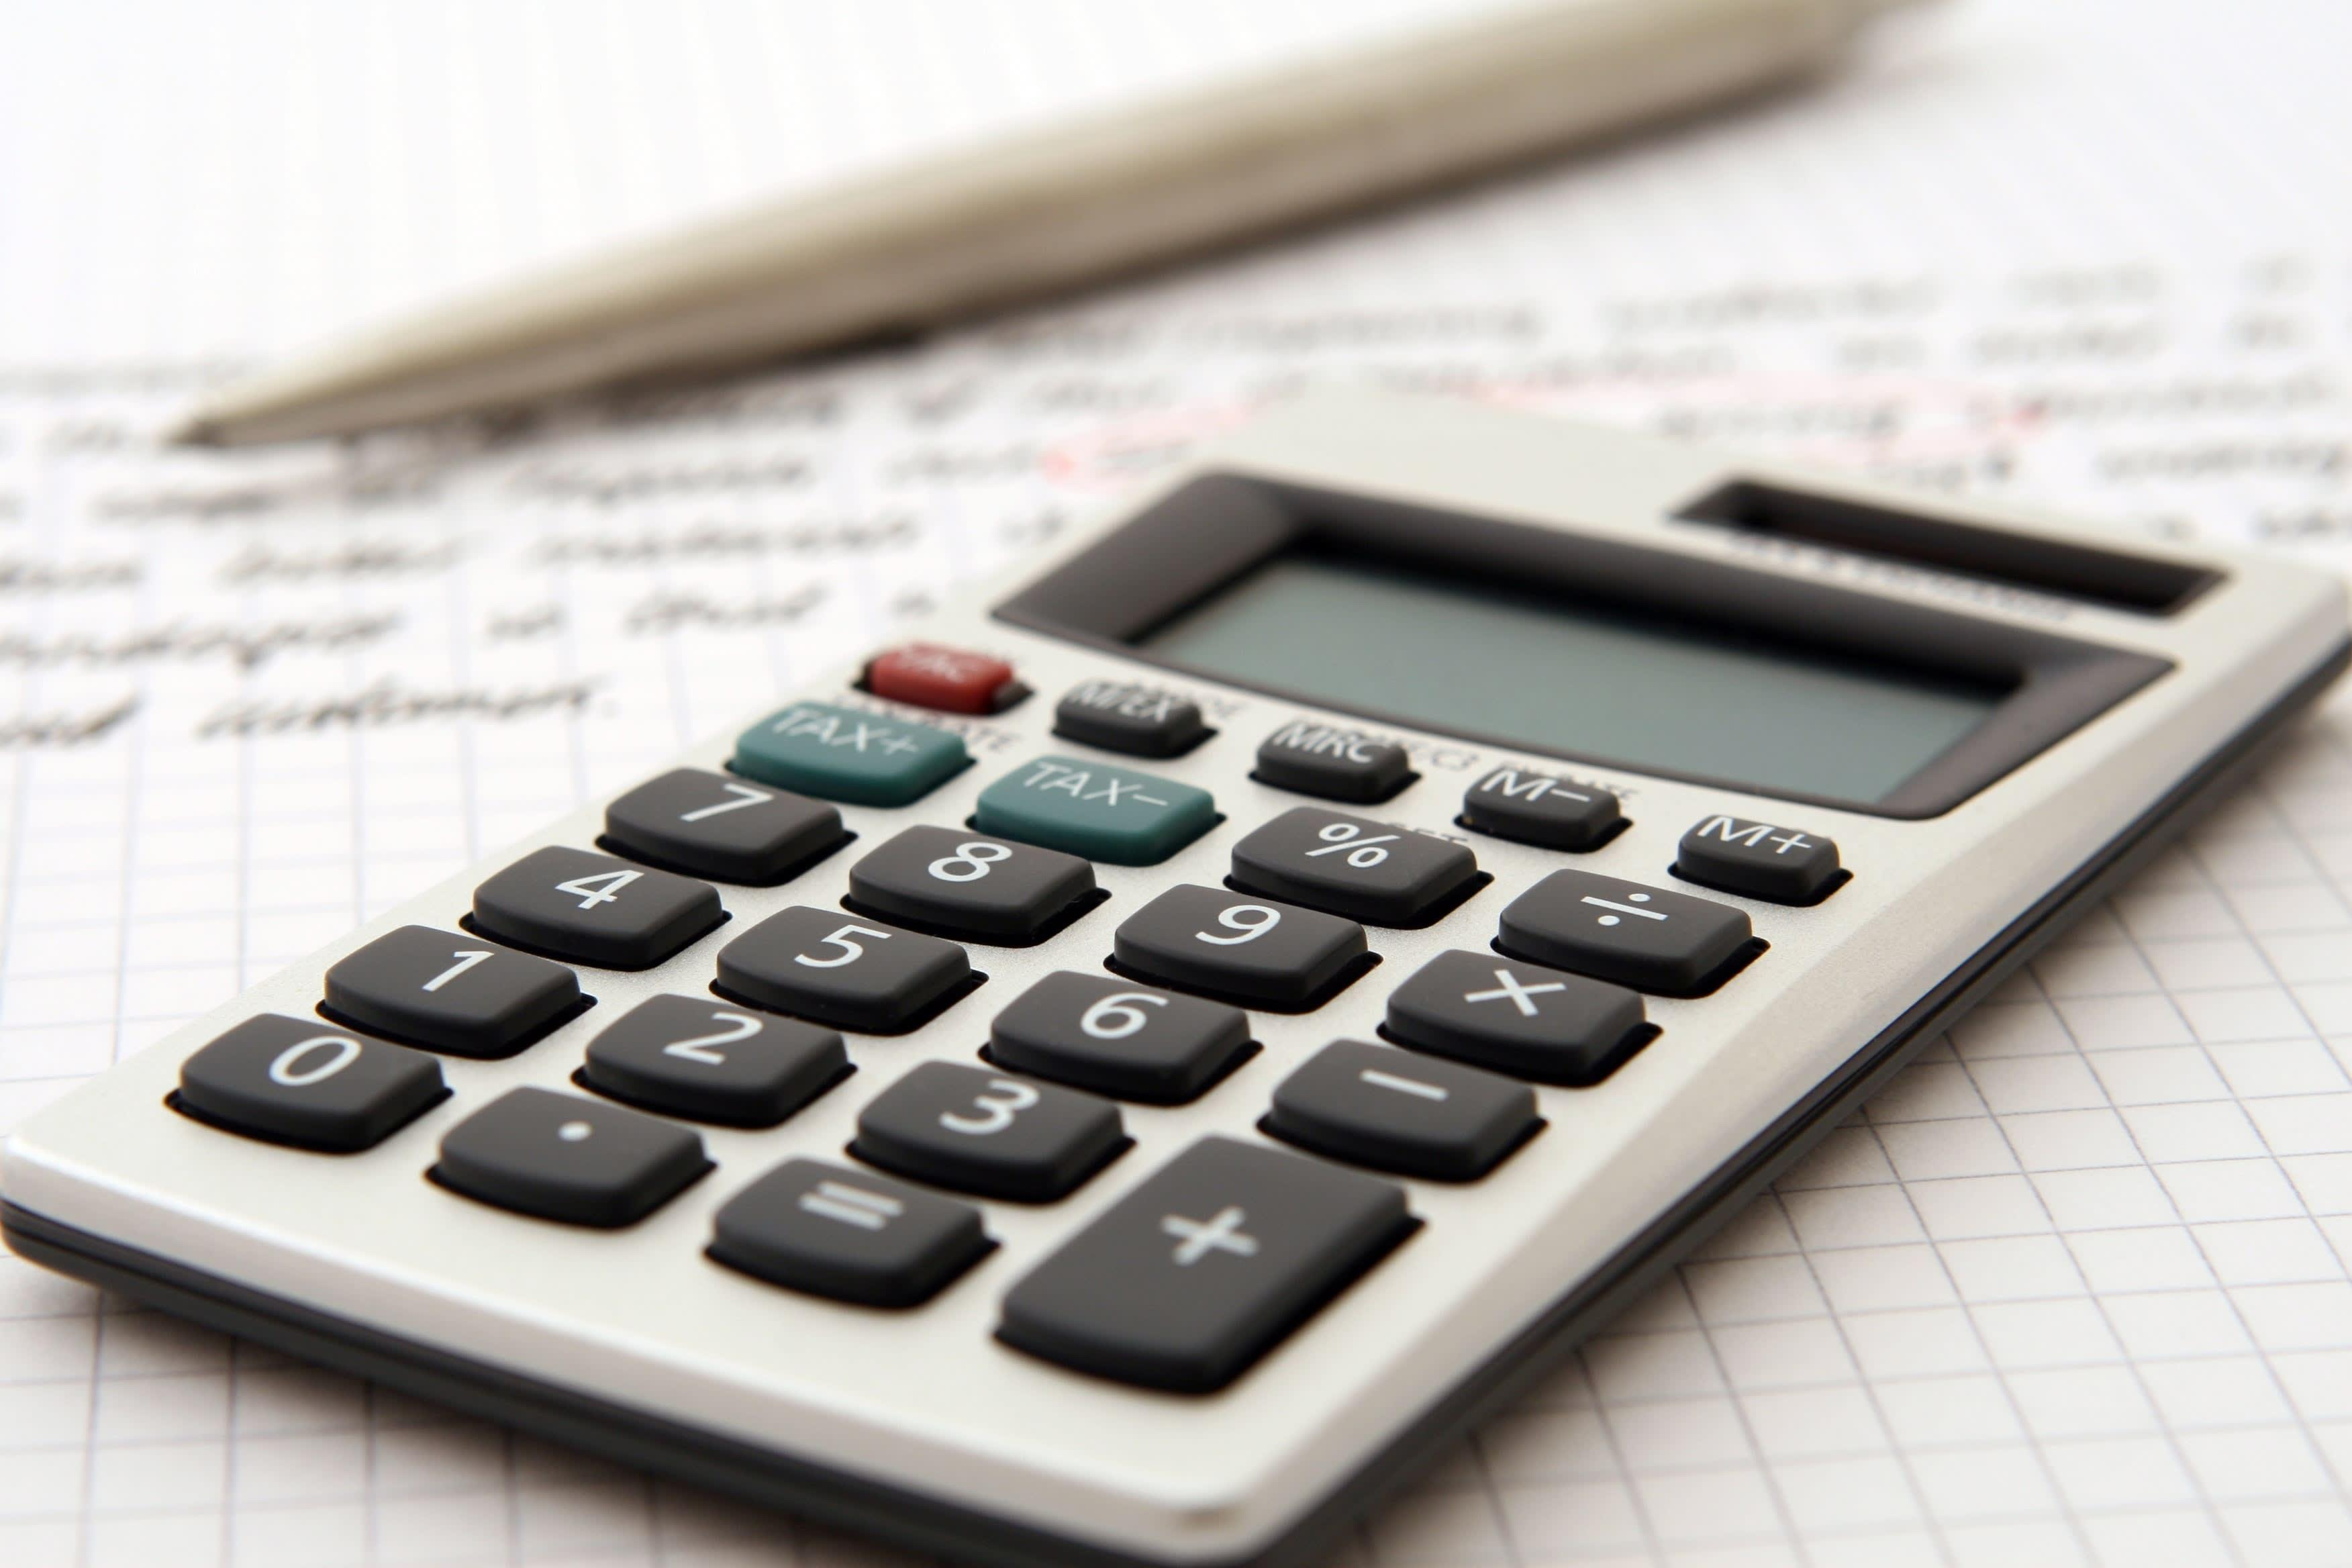 Regulator warns of widespread pension calculation errors